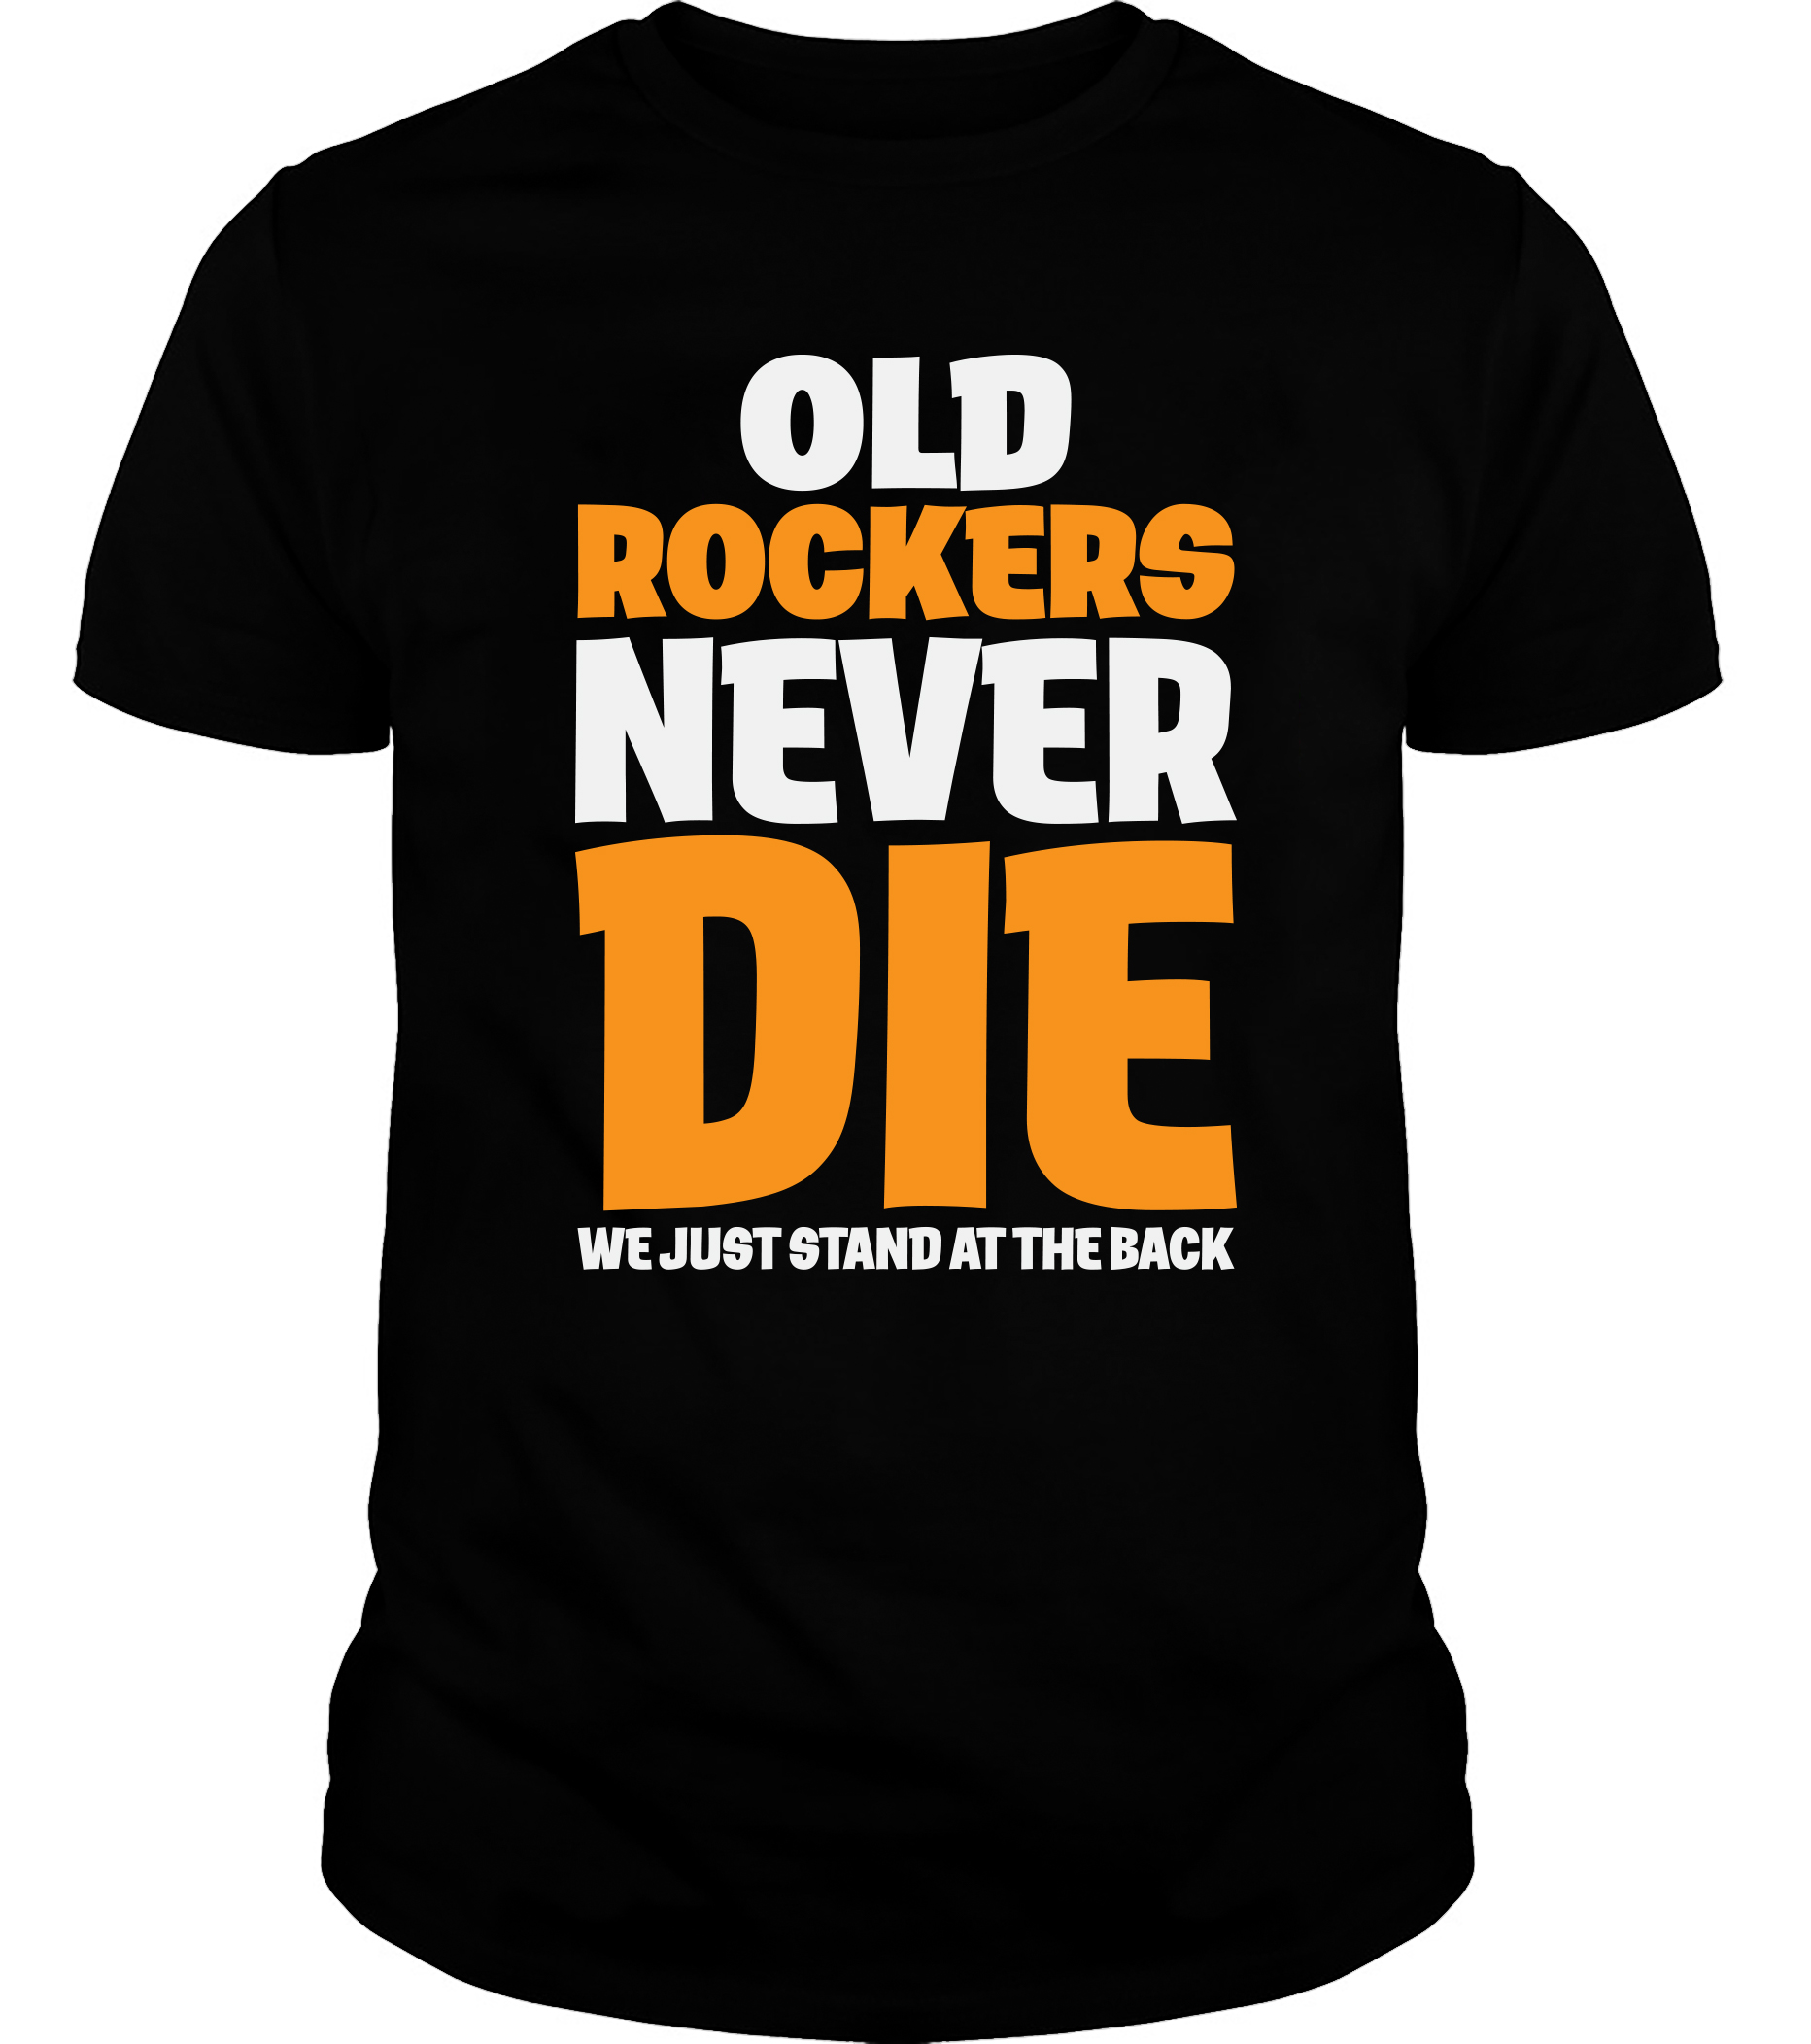 OLD ROCKERS NEVER DIE T-SHIRT